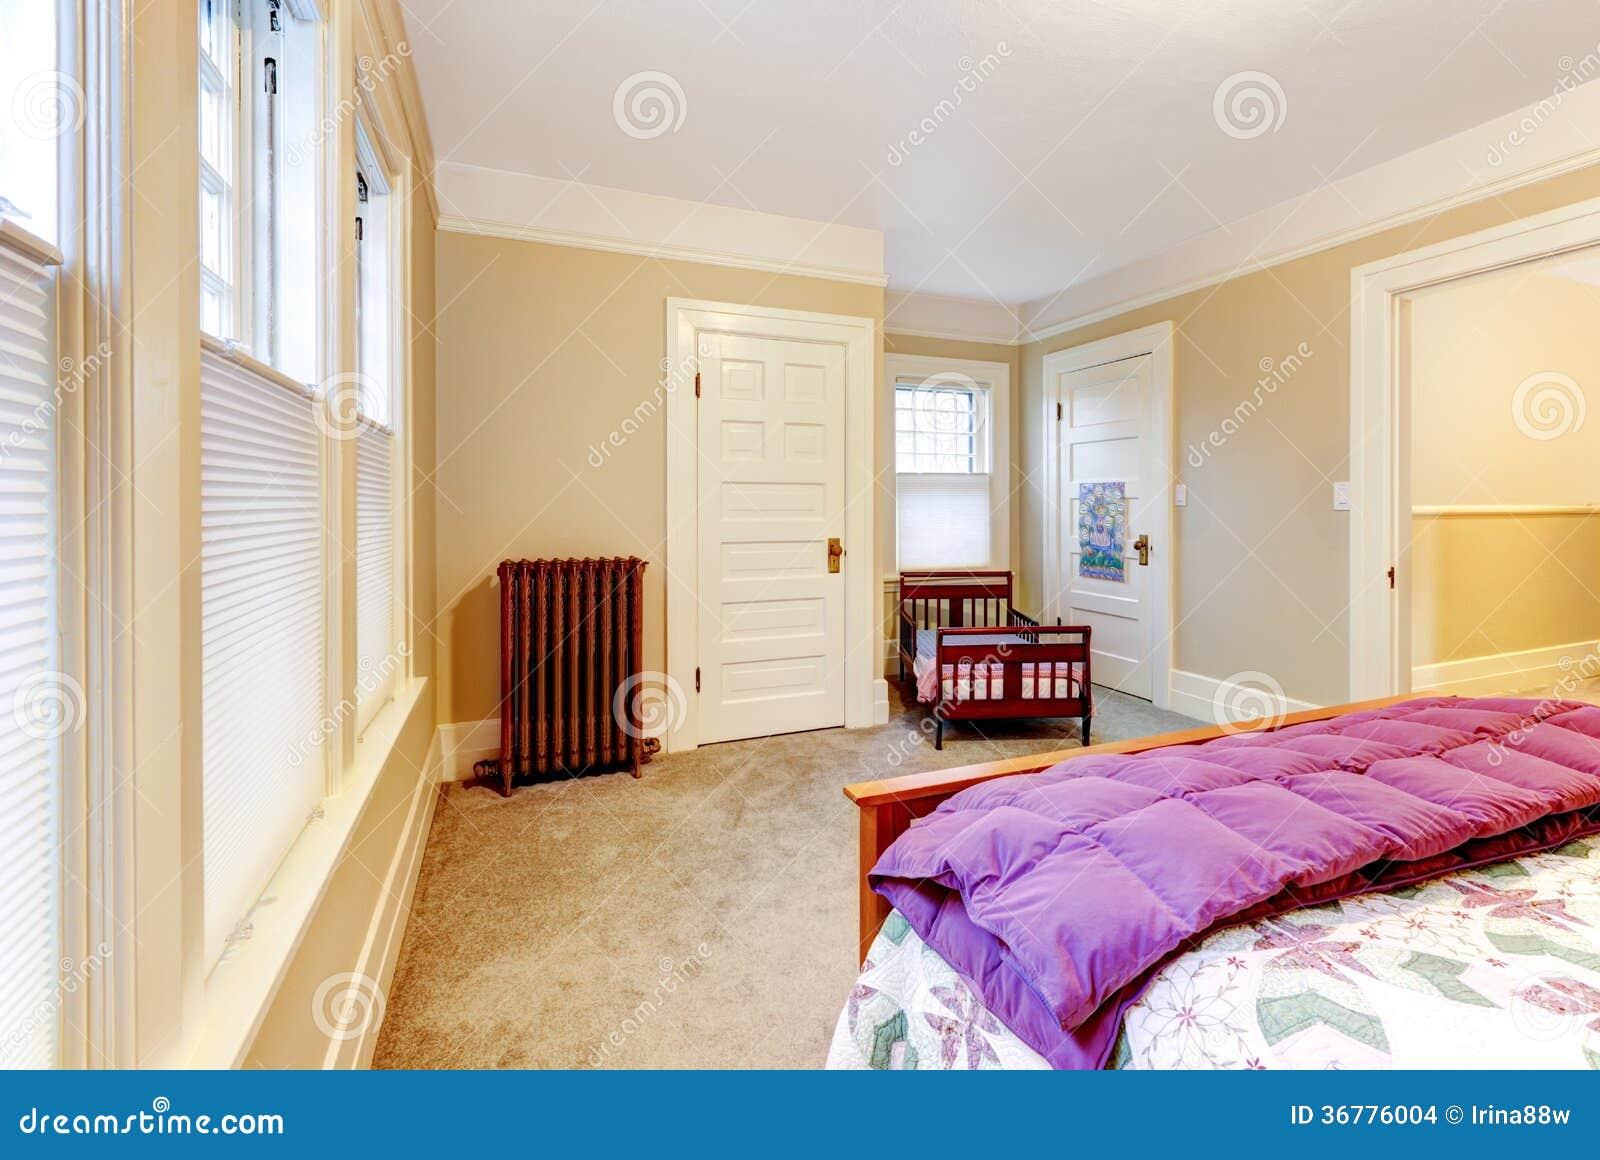 Light Cosy Small Bedroom With Baby Crib. Stock Photo ...